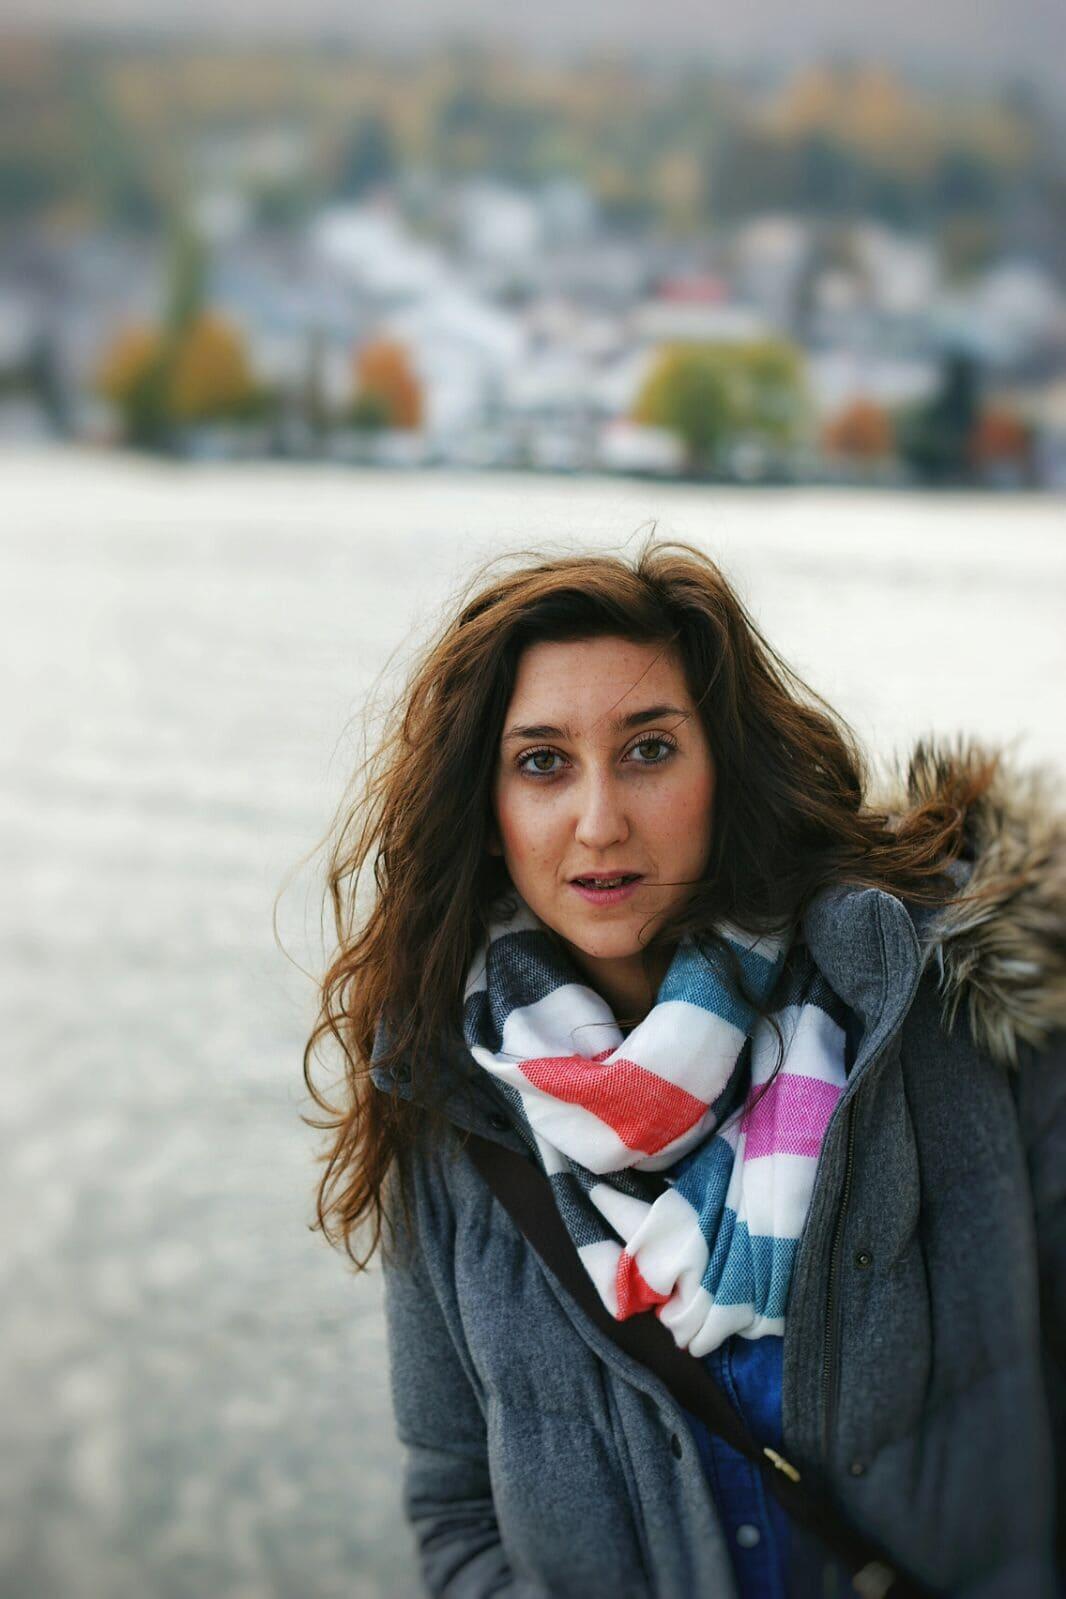 Alba Alicia from Fribourg